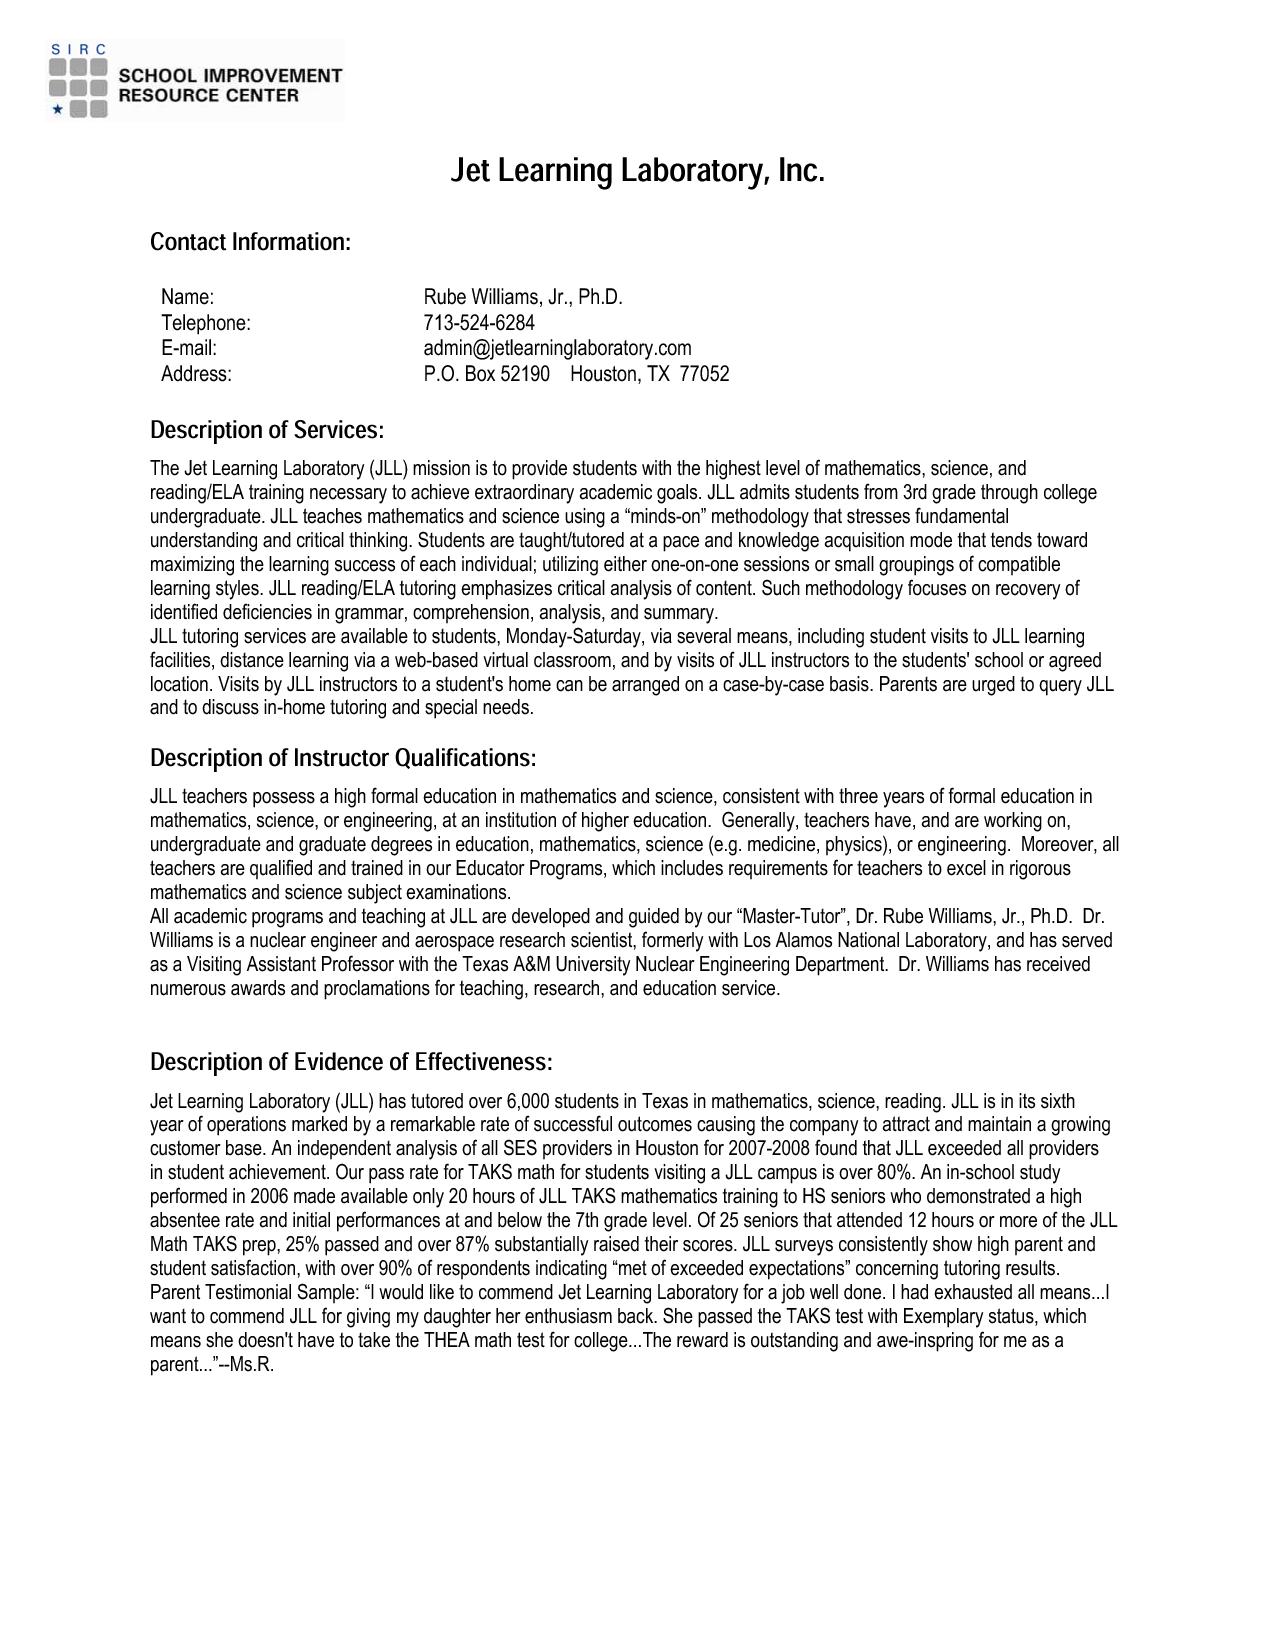 Resume Testimonials Samples